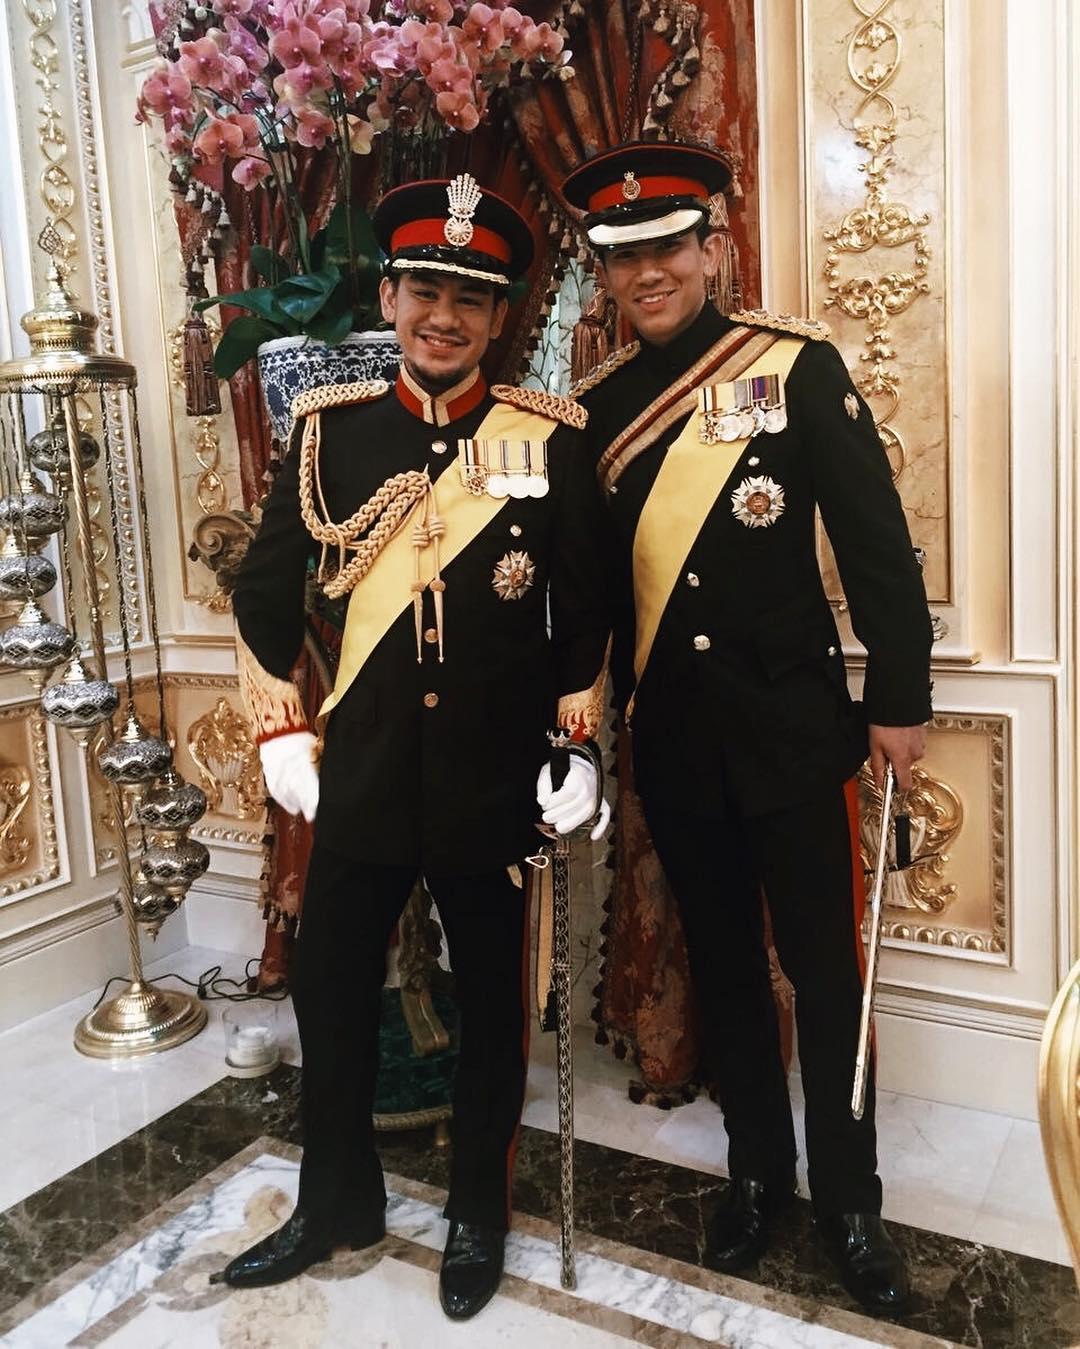 Pengiran Muda Abdul Azim mangkat, Brunei berkabung 7 hari